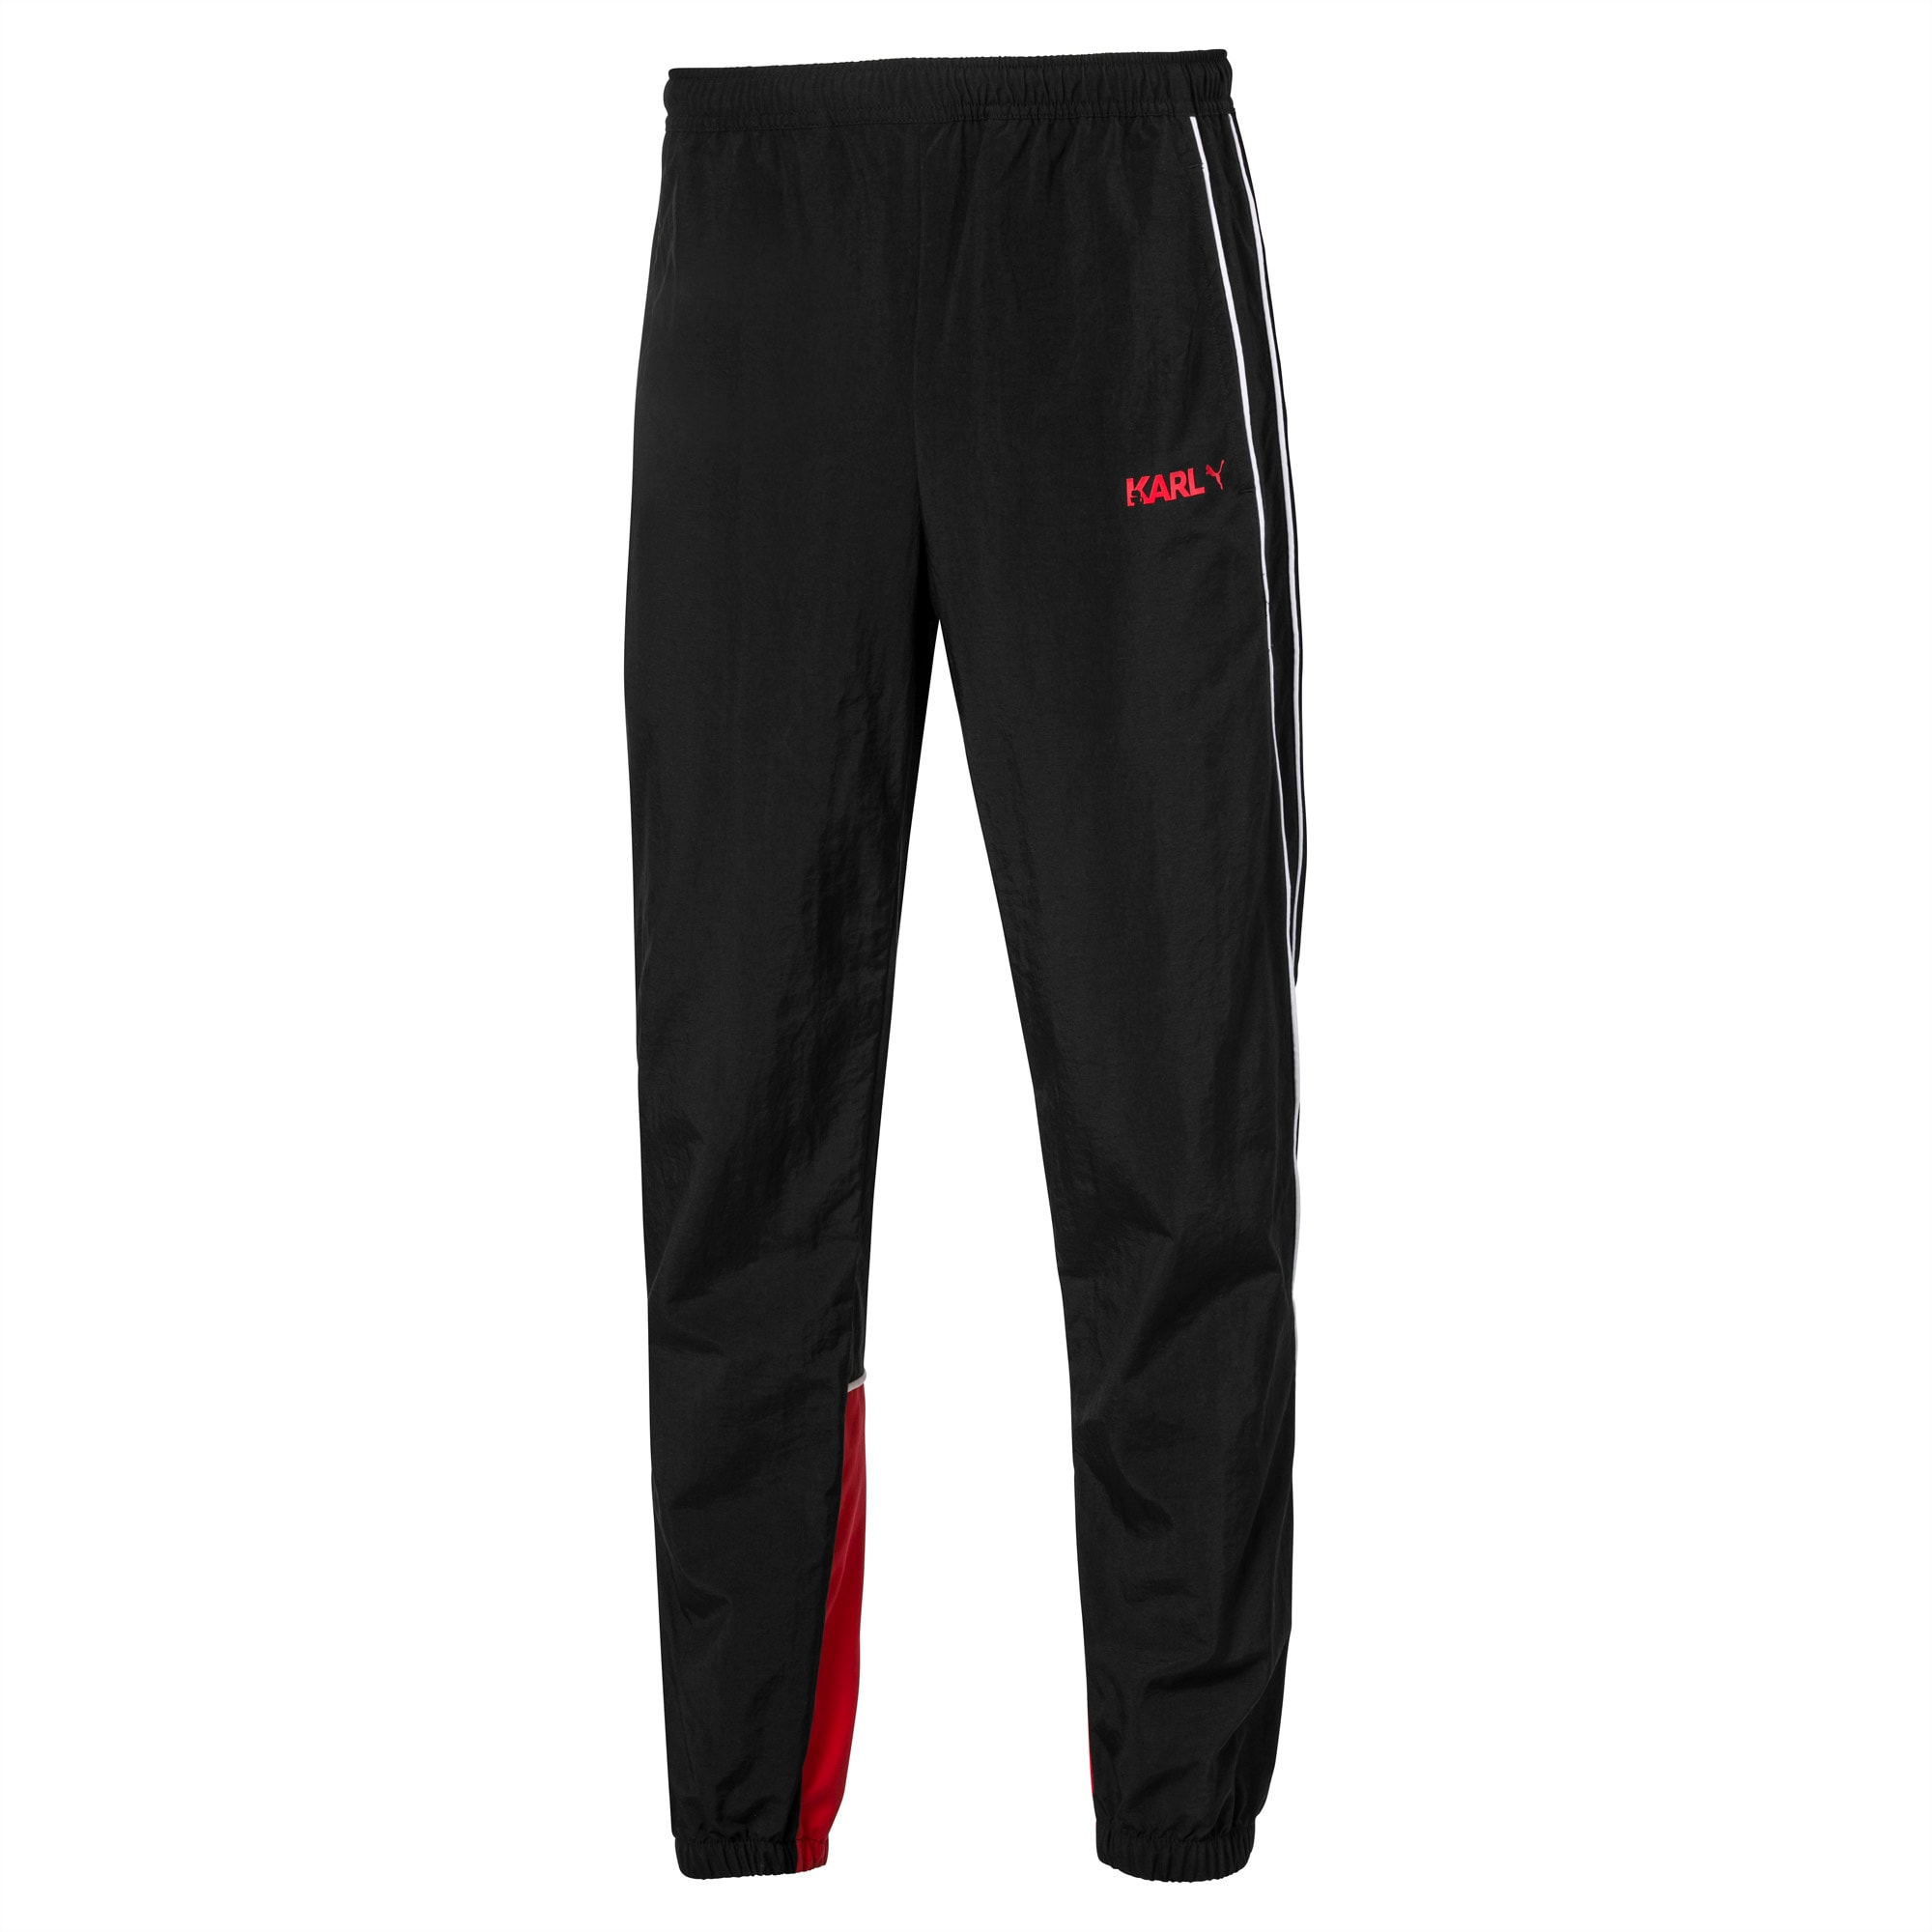 Pantaloni sportivi da uomo in maglia PUMA x KARL LAGERFELD